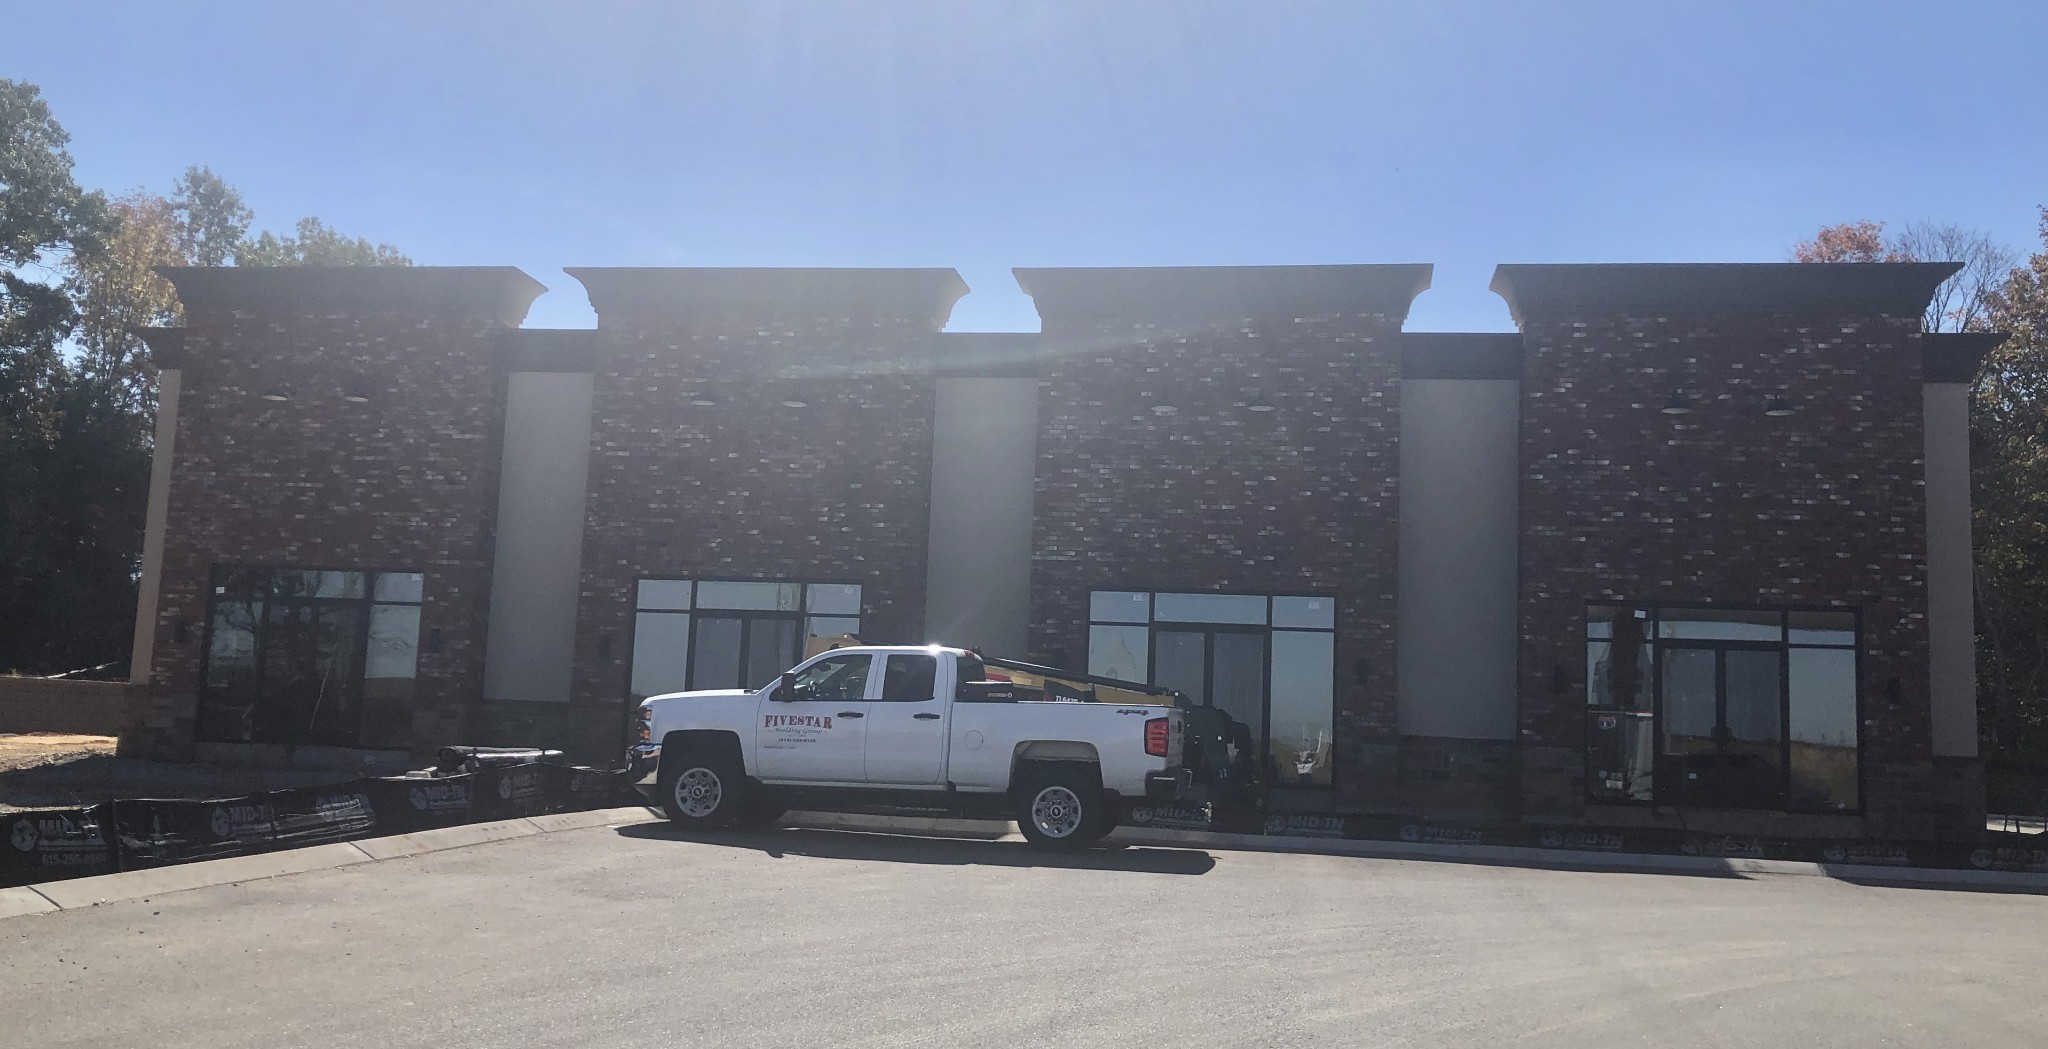 1560 Hankook Rd, Suite B, Clarksville TN 37043 - Photo 1